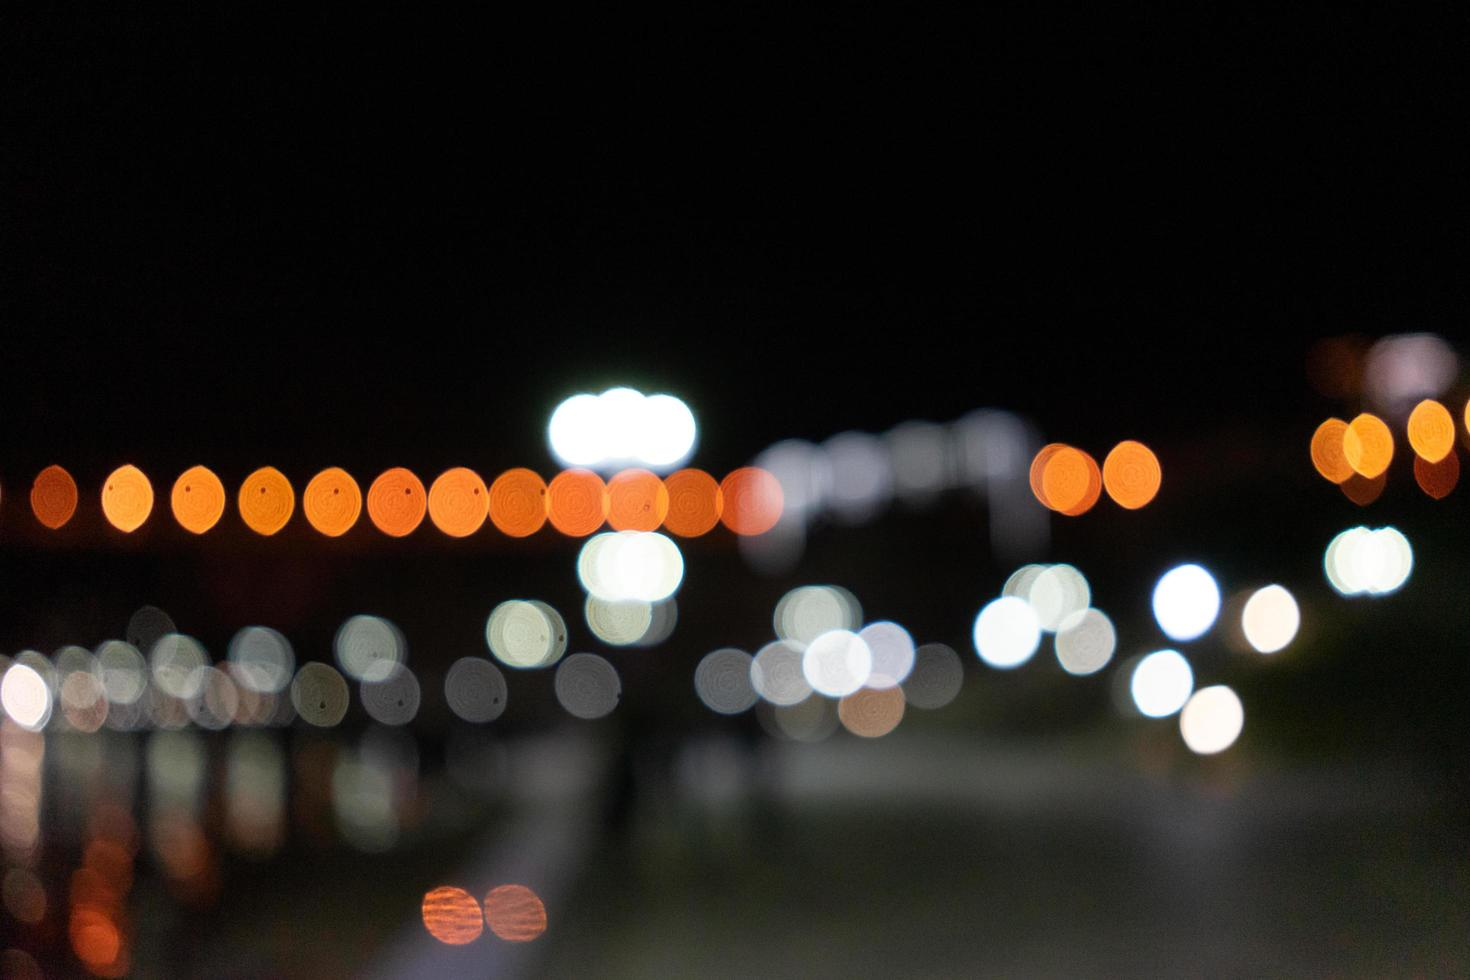 abstrakt nattbakgrund med ljus bokeh foto